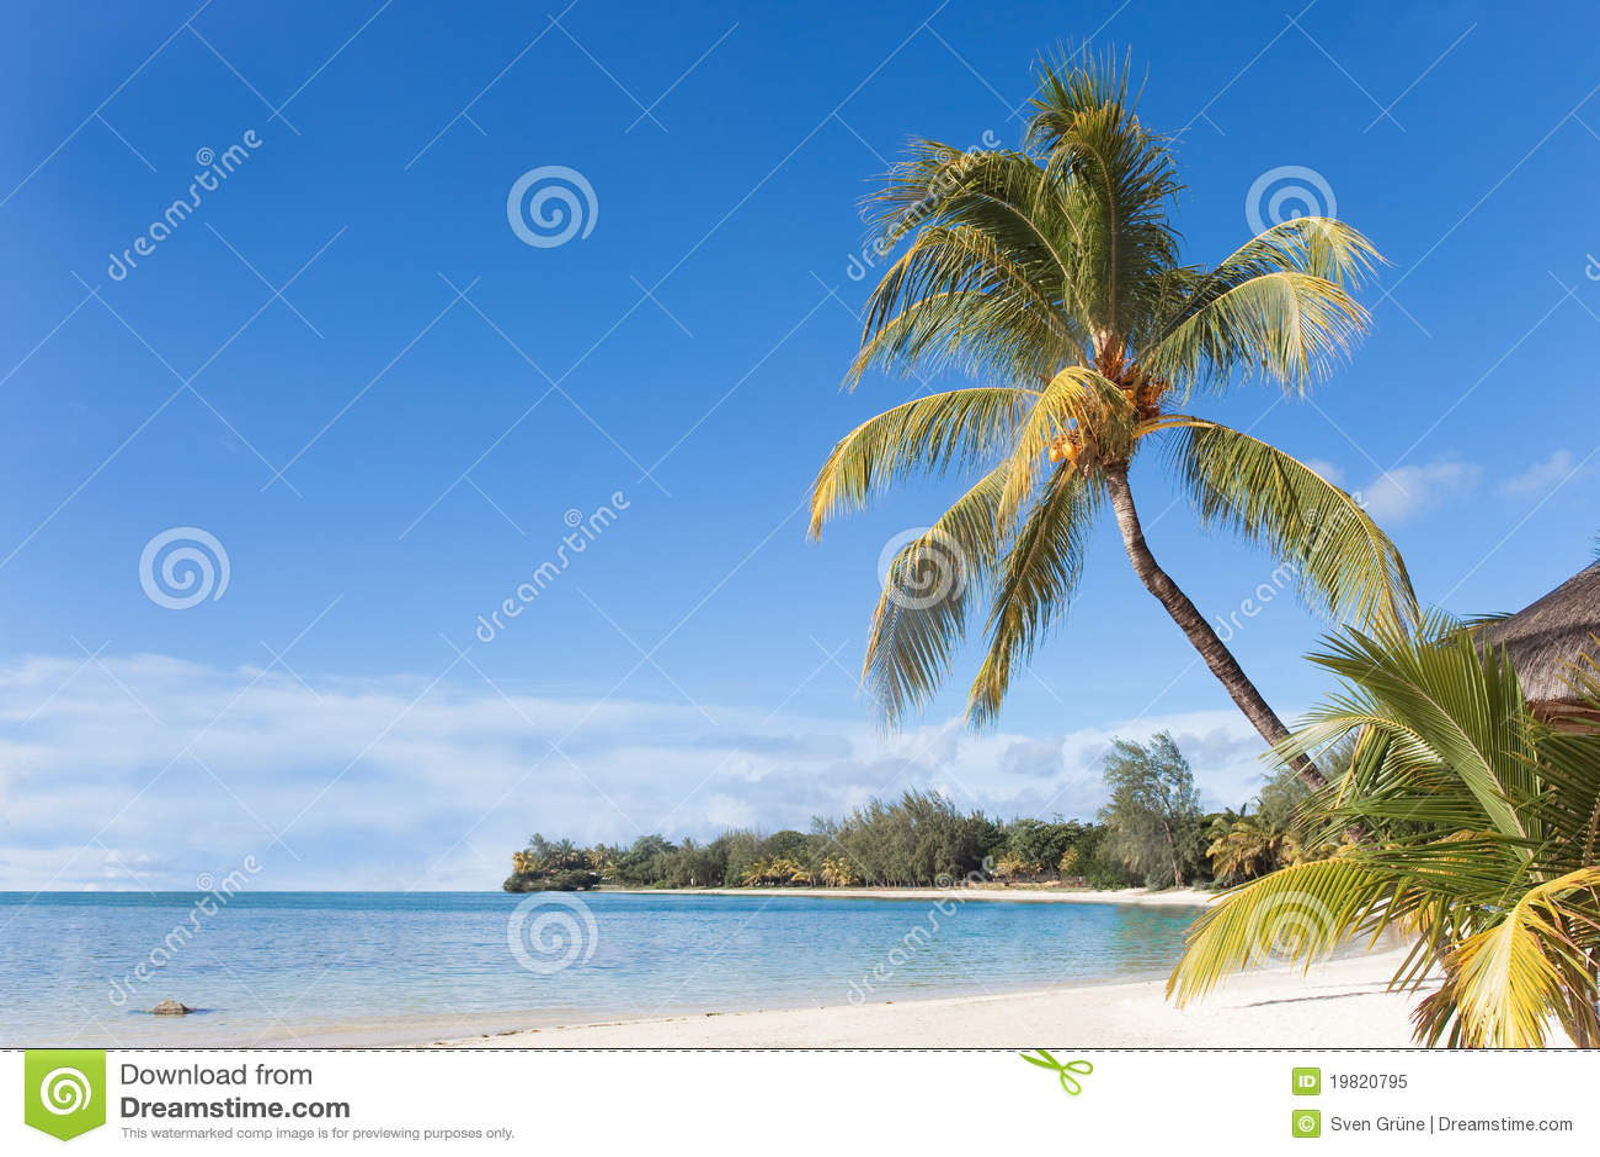 Download Mauritius stockbild. Bild von palme, strand, urlaub, feiertag - 19820795